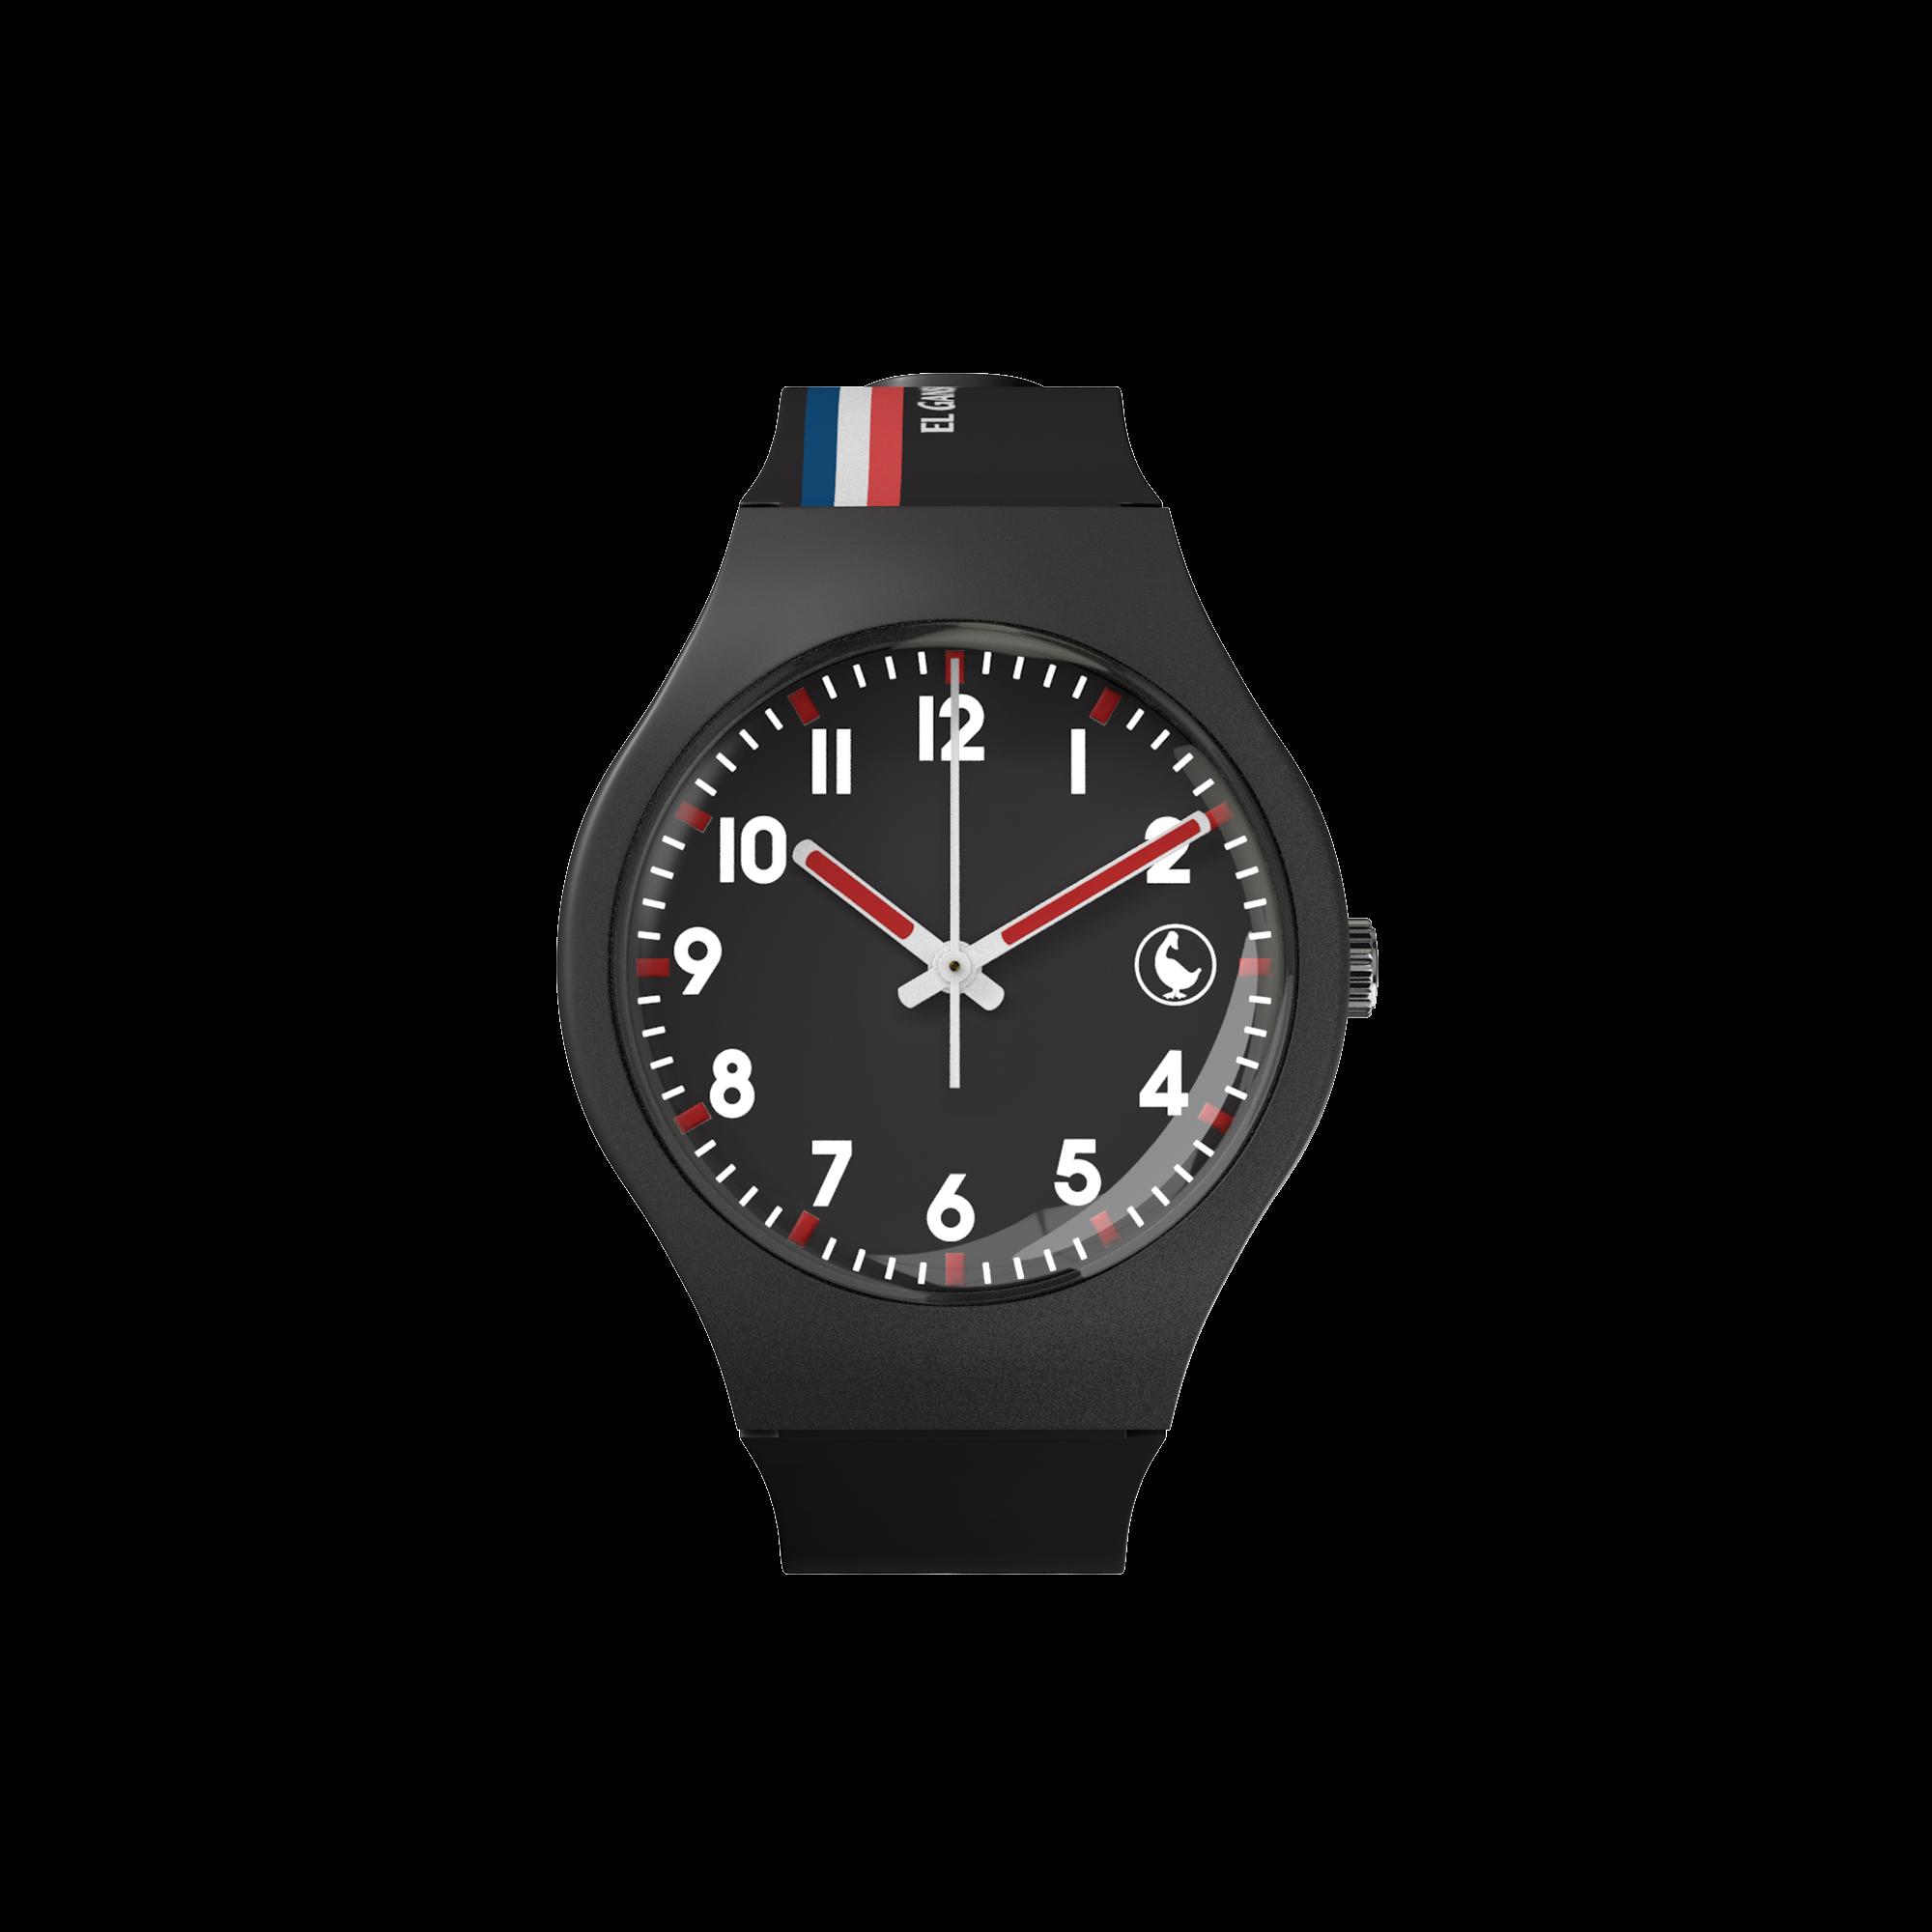 Reloj Ganso Gris Image 1